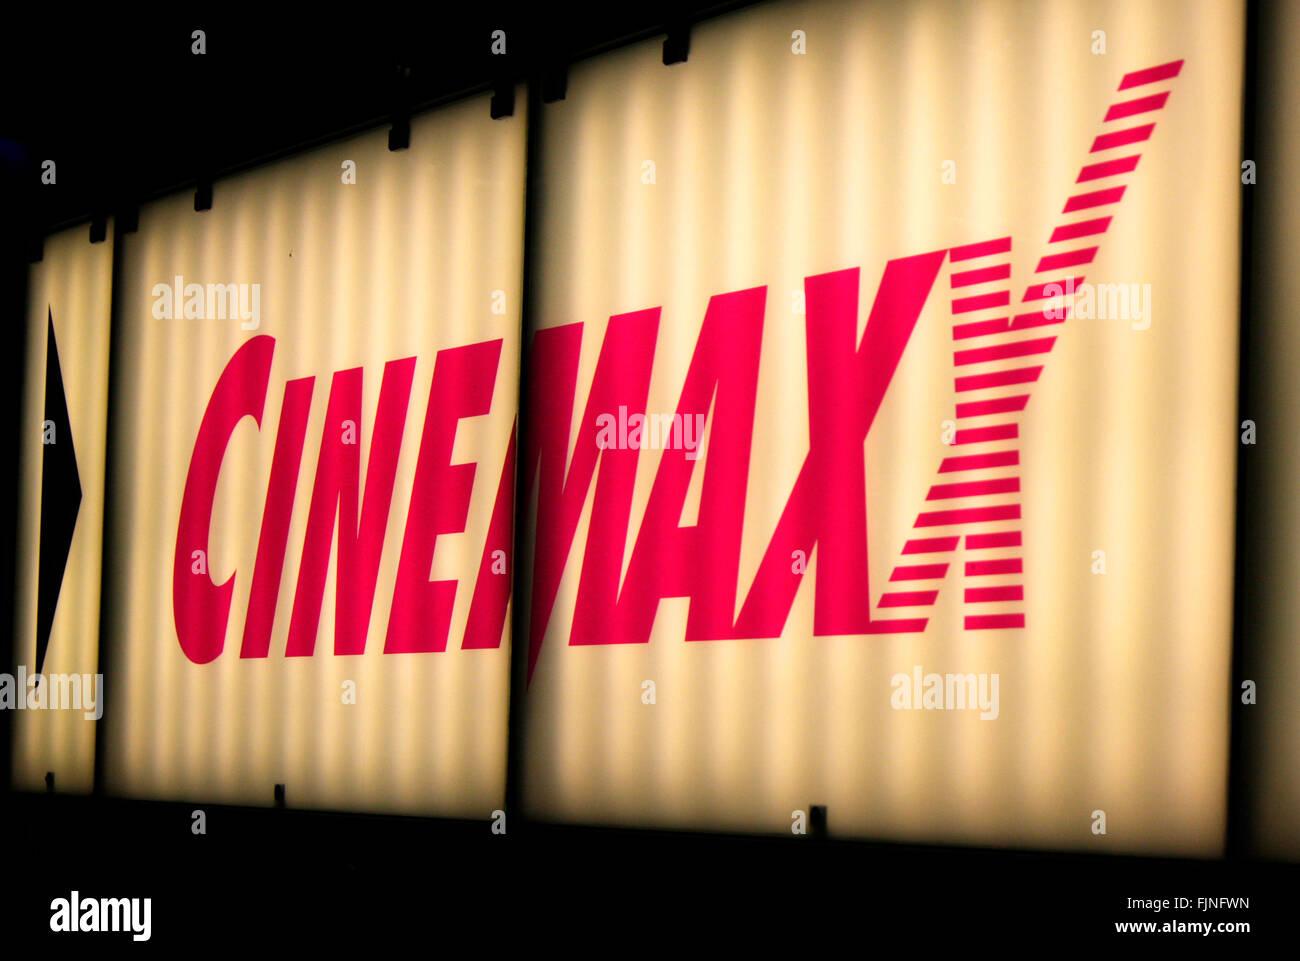 Cinemaxx stock photos cinemaxx stock images alamy markenname cinemaxx berlin stopboris Choice Image